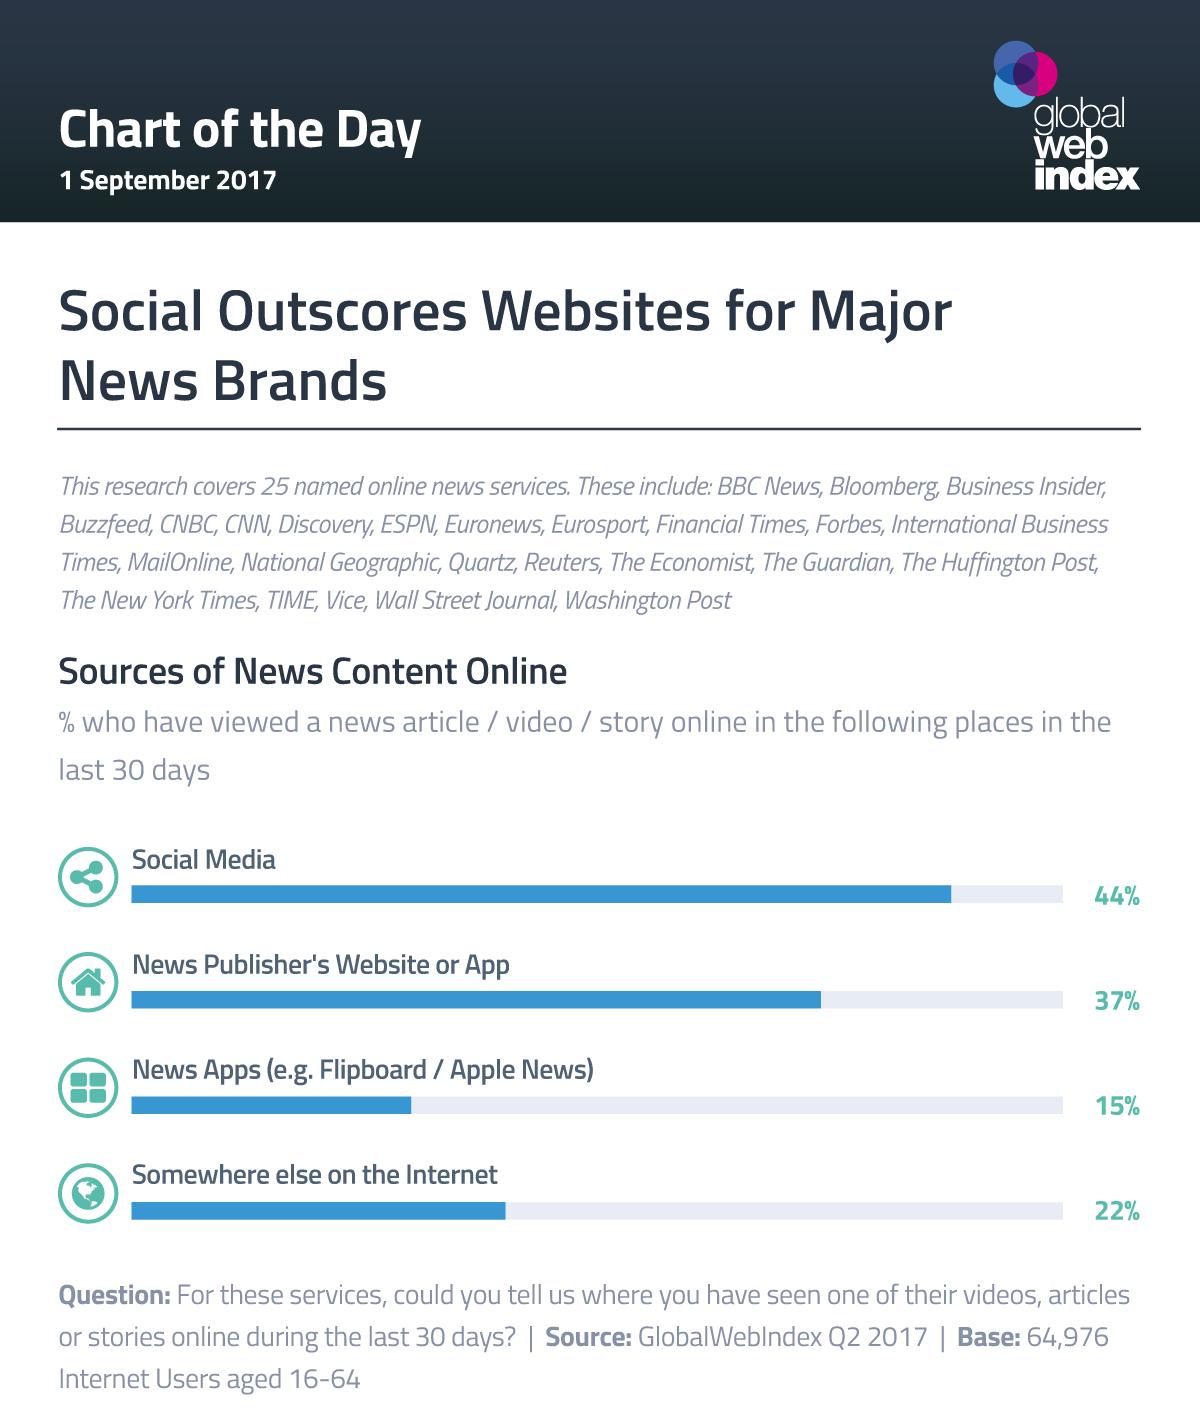 Social Outscores Websites for Major News Brands